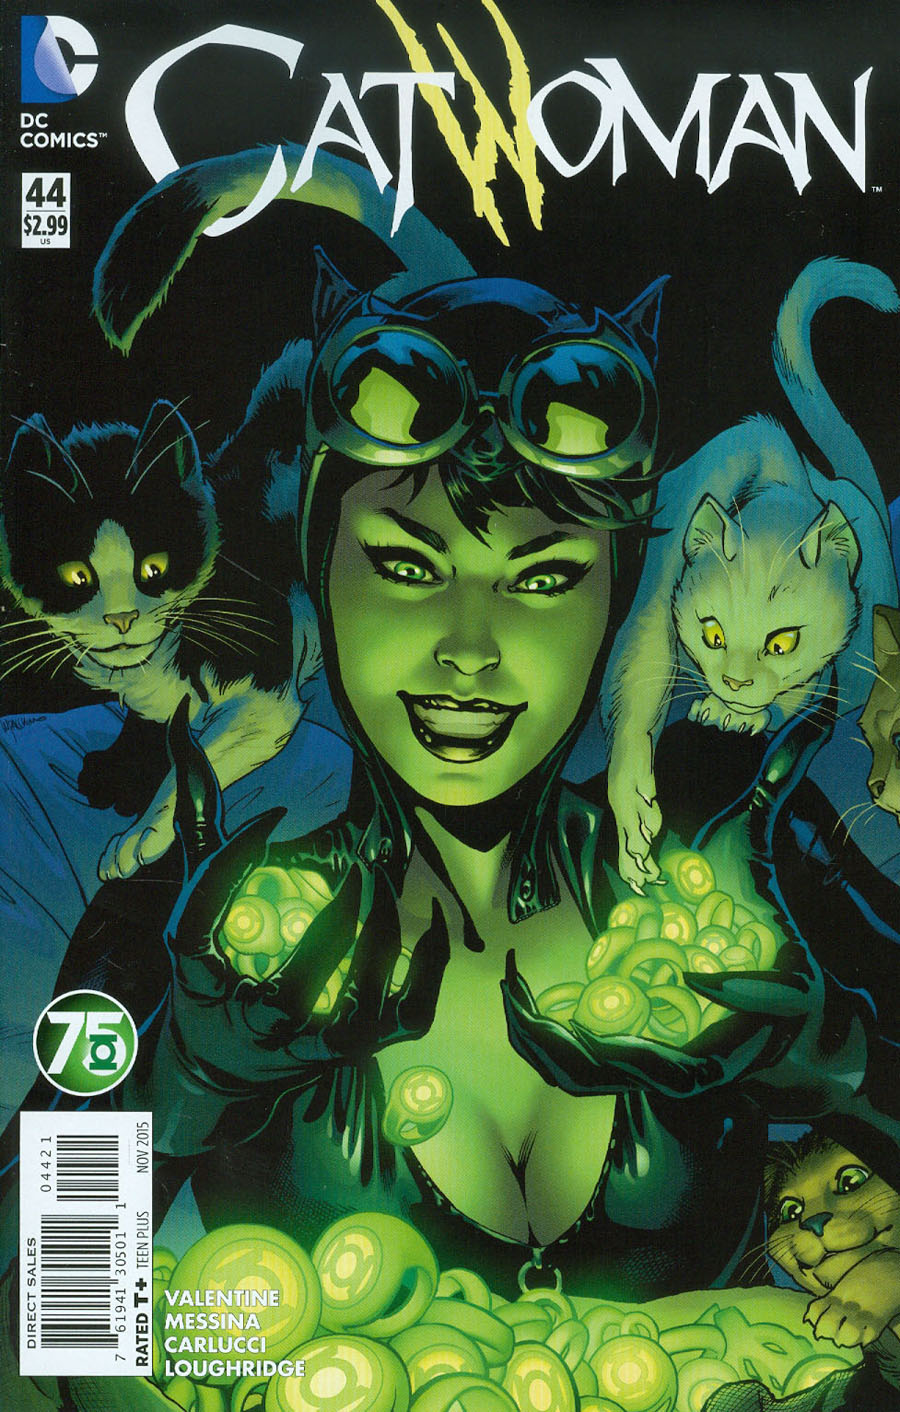 Catwoman Vol 4 #44 Cover B Variant Emanuela Lupacchino Green Lantern 75th Anniversary Cover